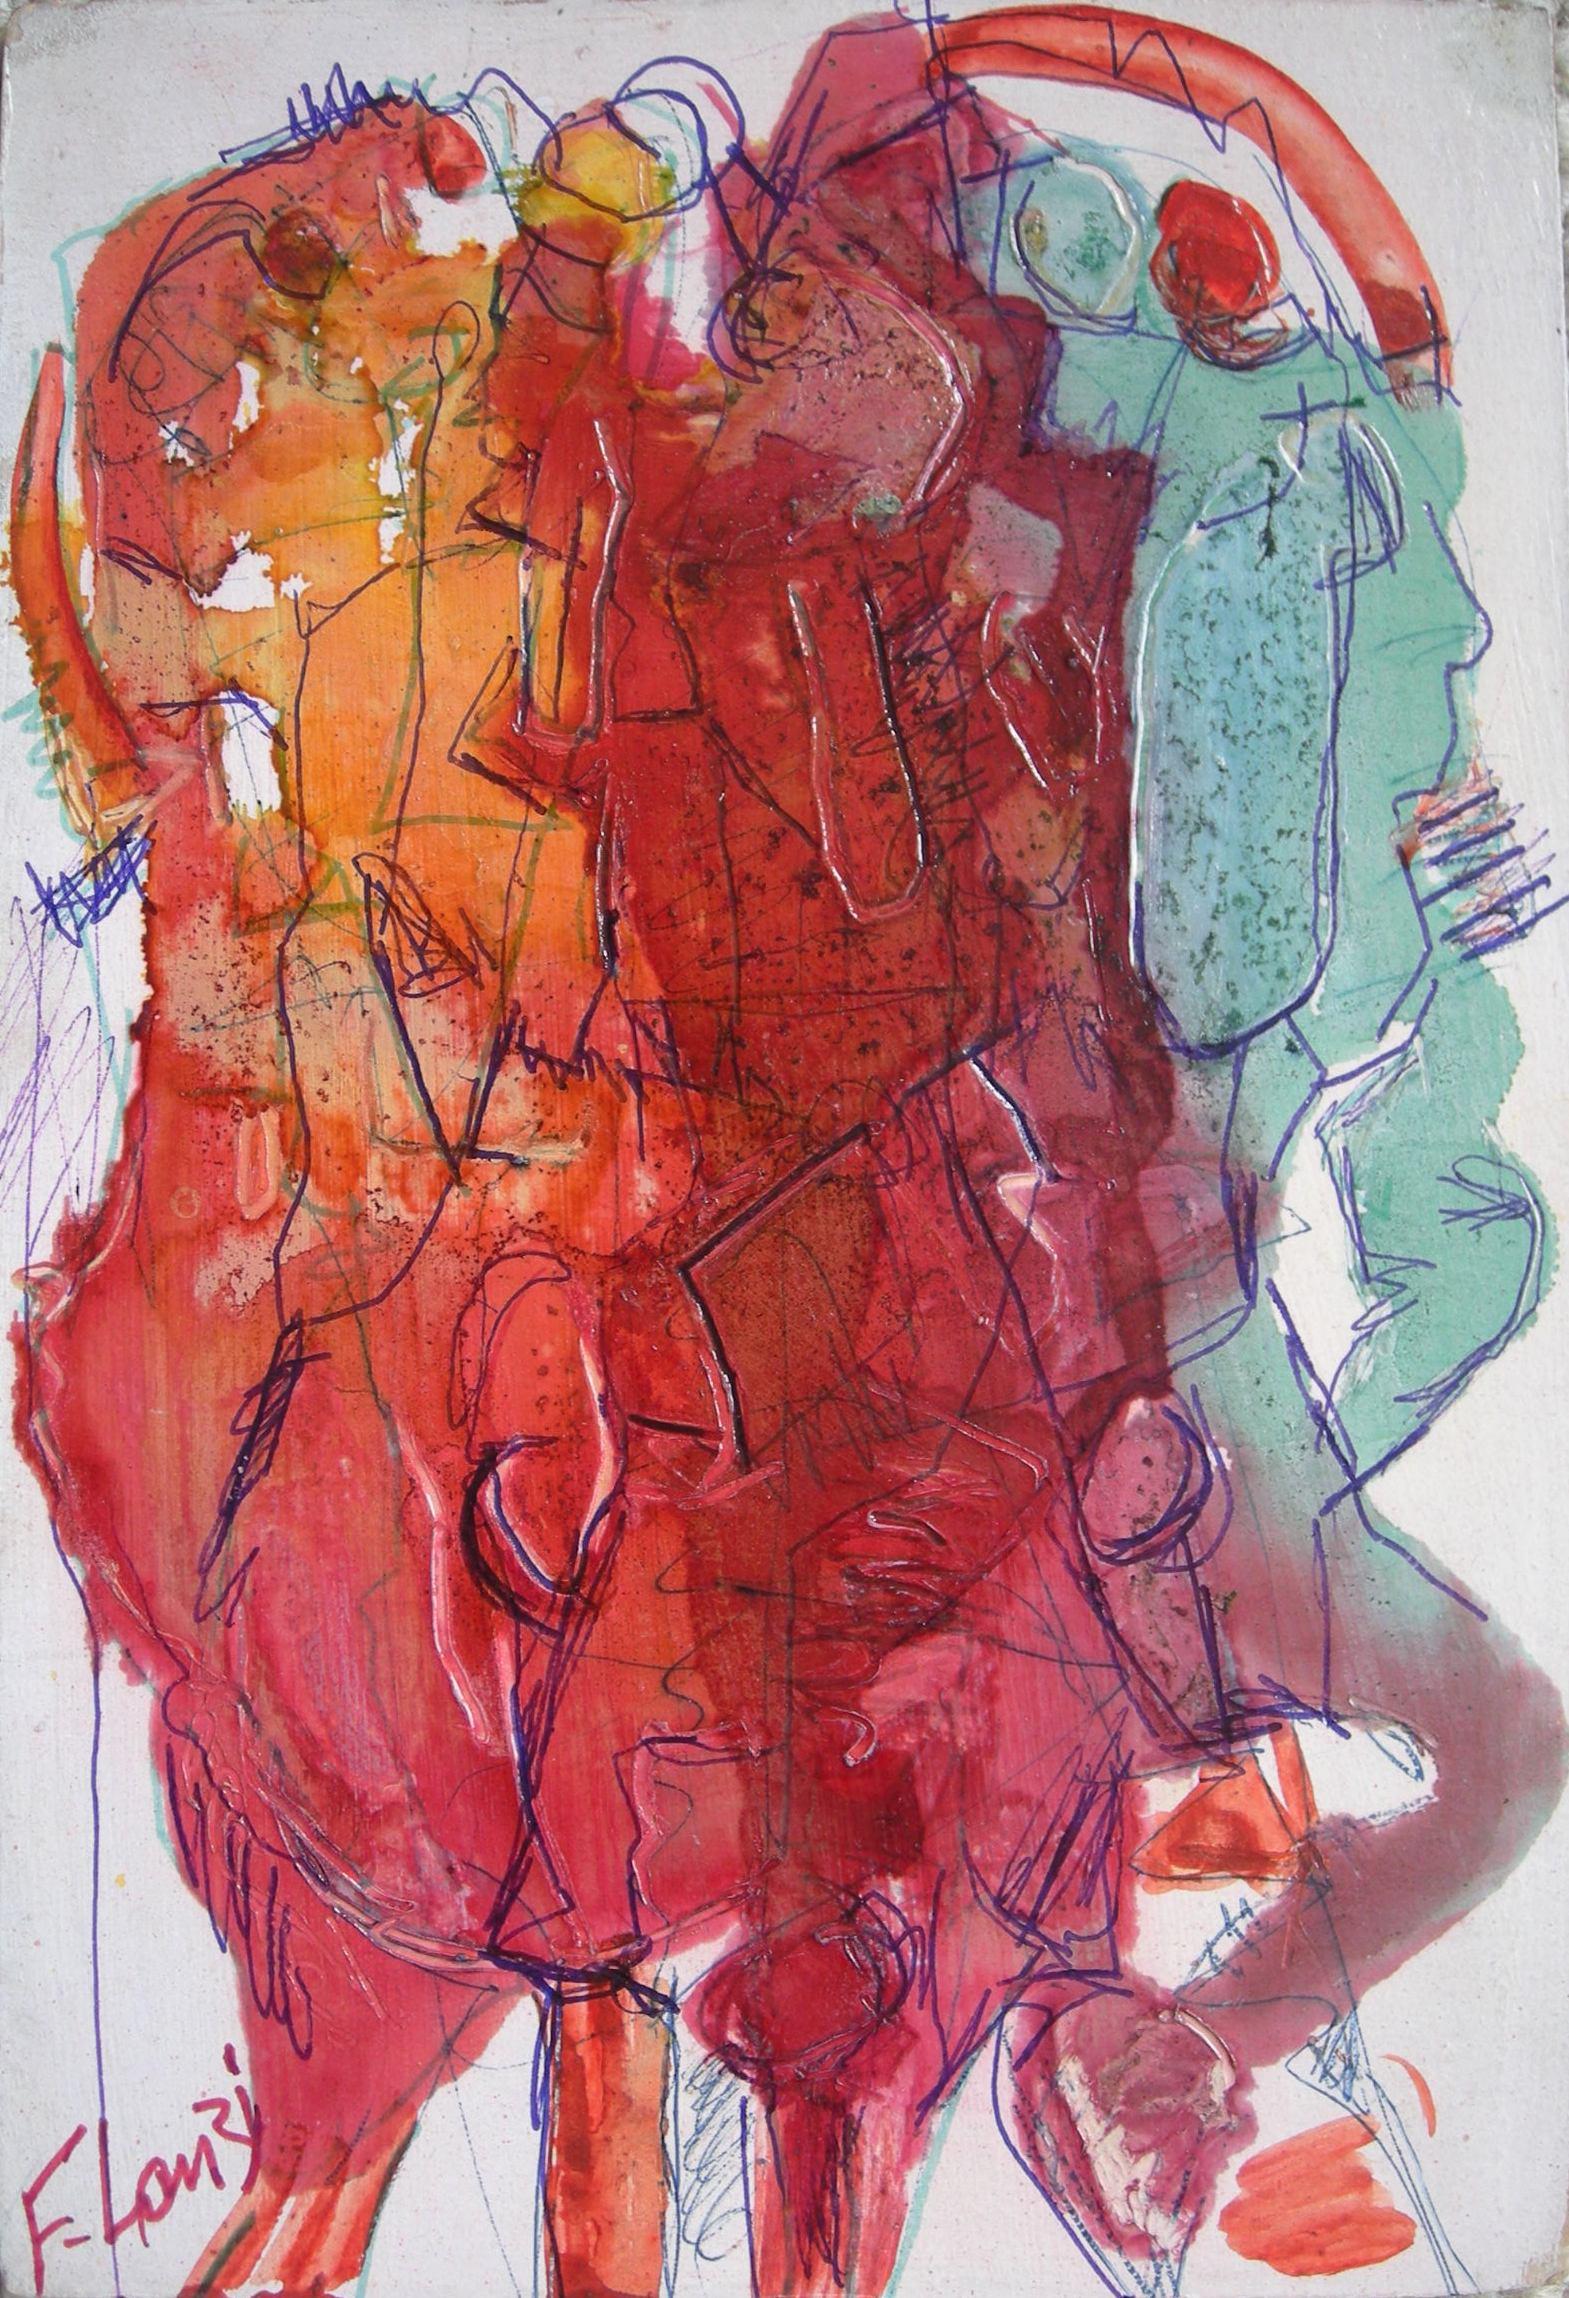 Francois Lanzi - Abstract 1965